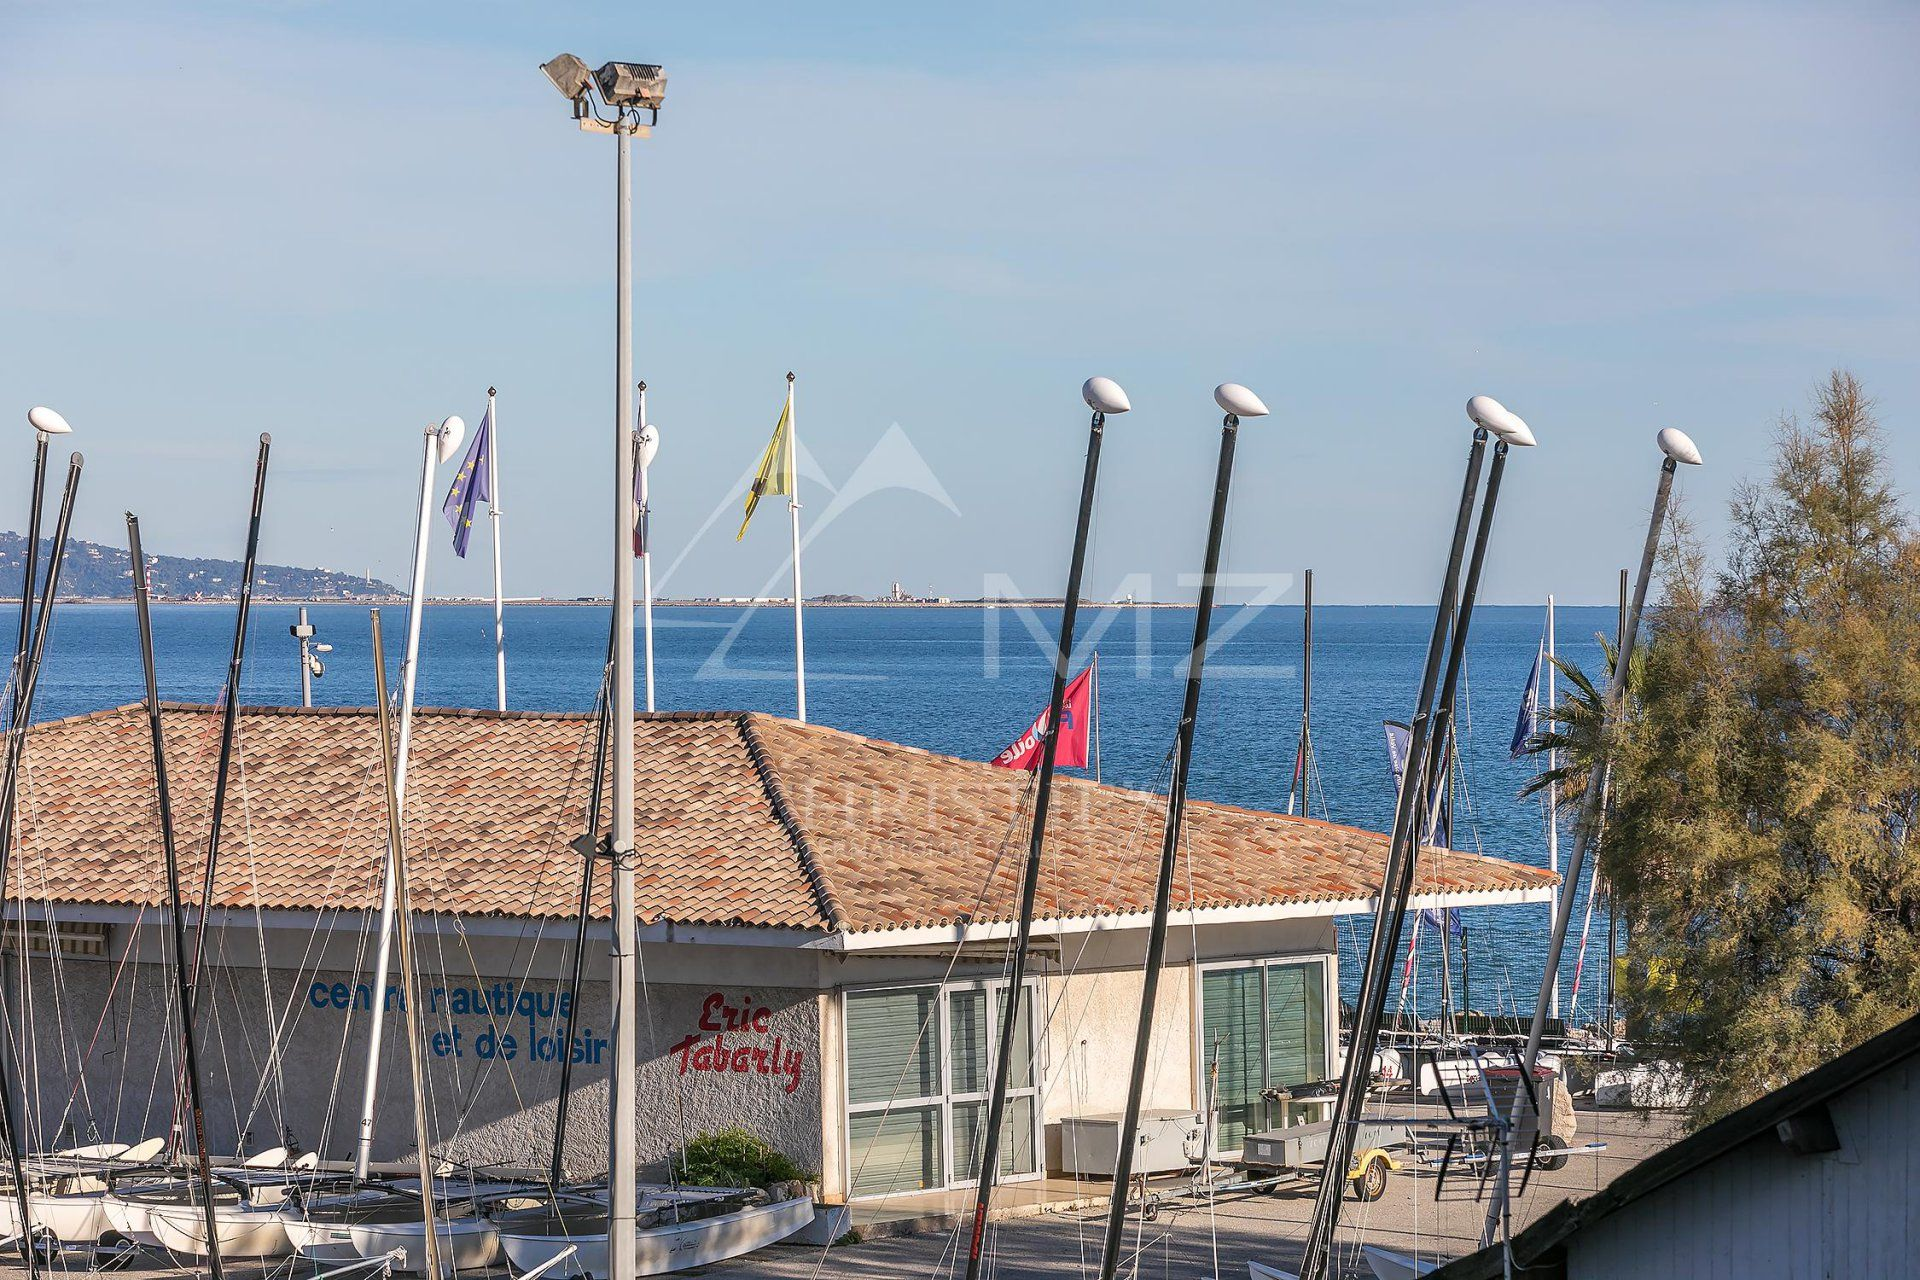 Villeneuve Loubet - Close to the sea